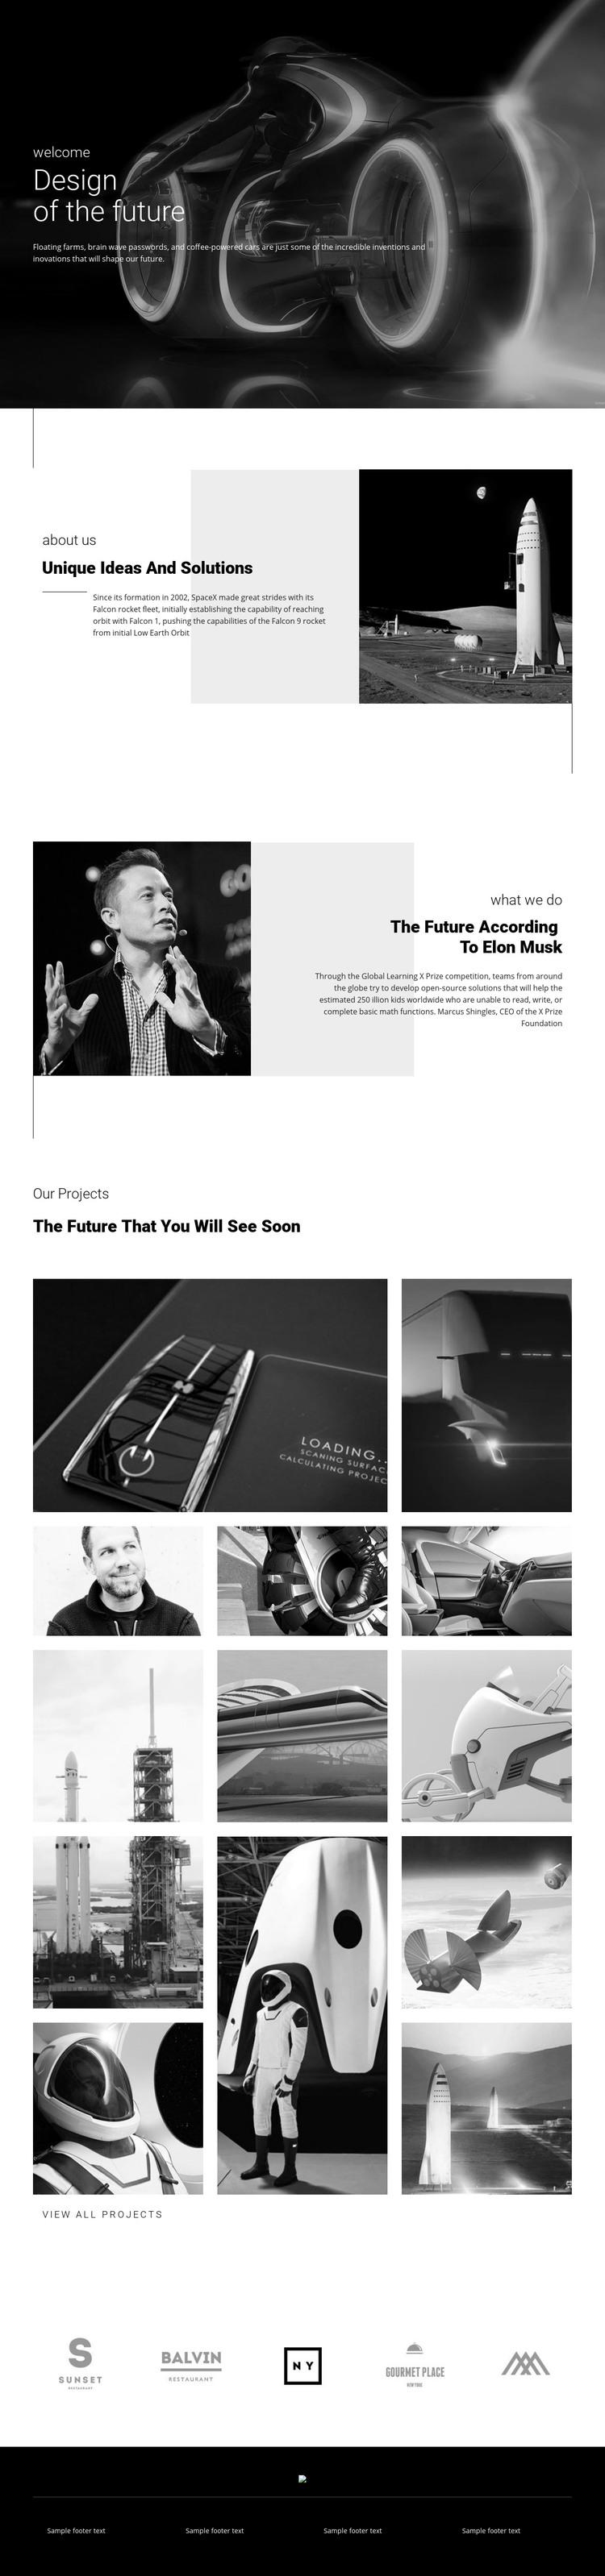 Design of future technology Homepage Design